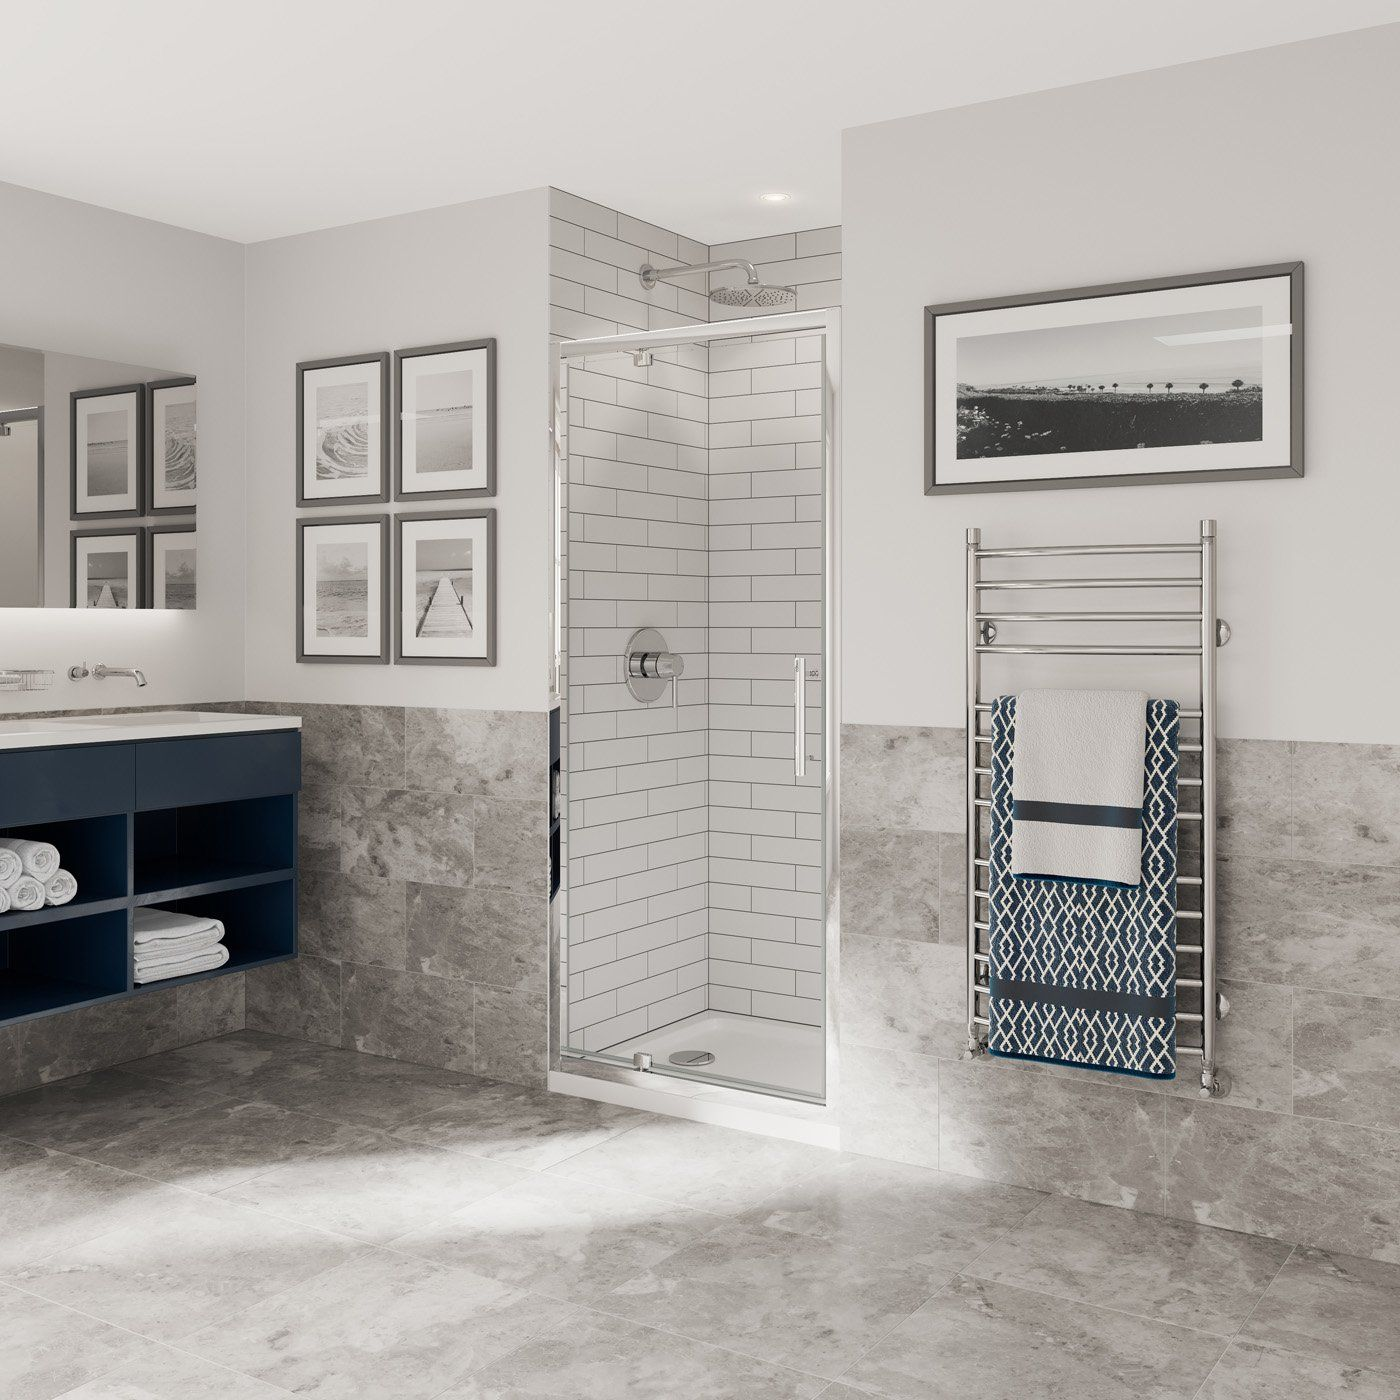 Optima 6 Pivot Door Chrome Shower Enclosure Coram Showers Shower Doors Shower Enclosure Pivot Doors